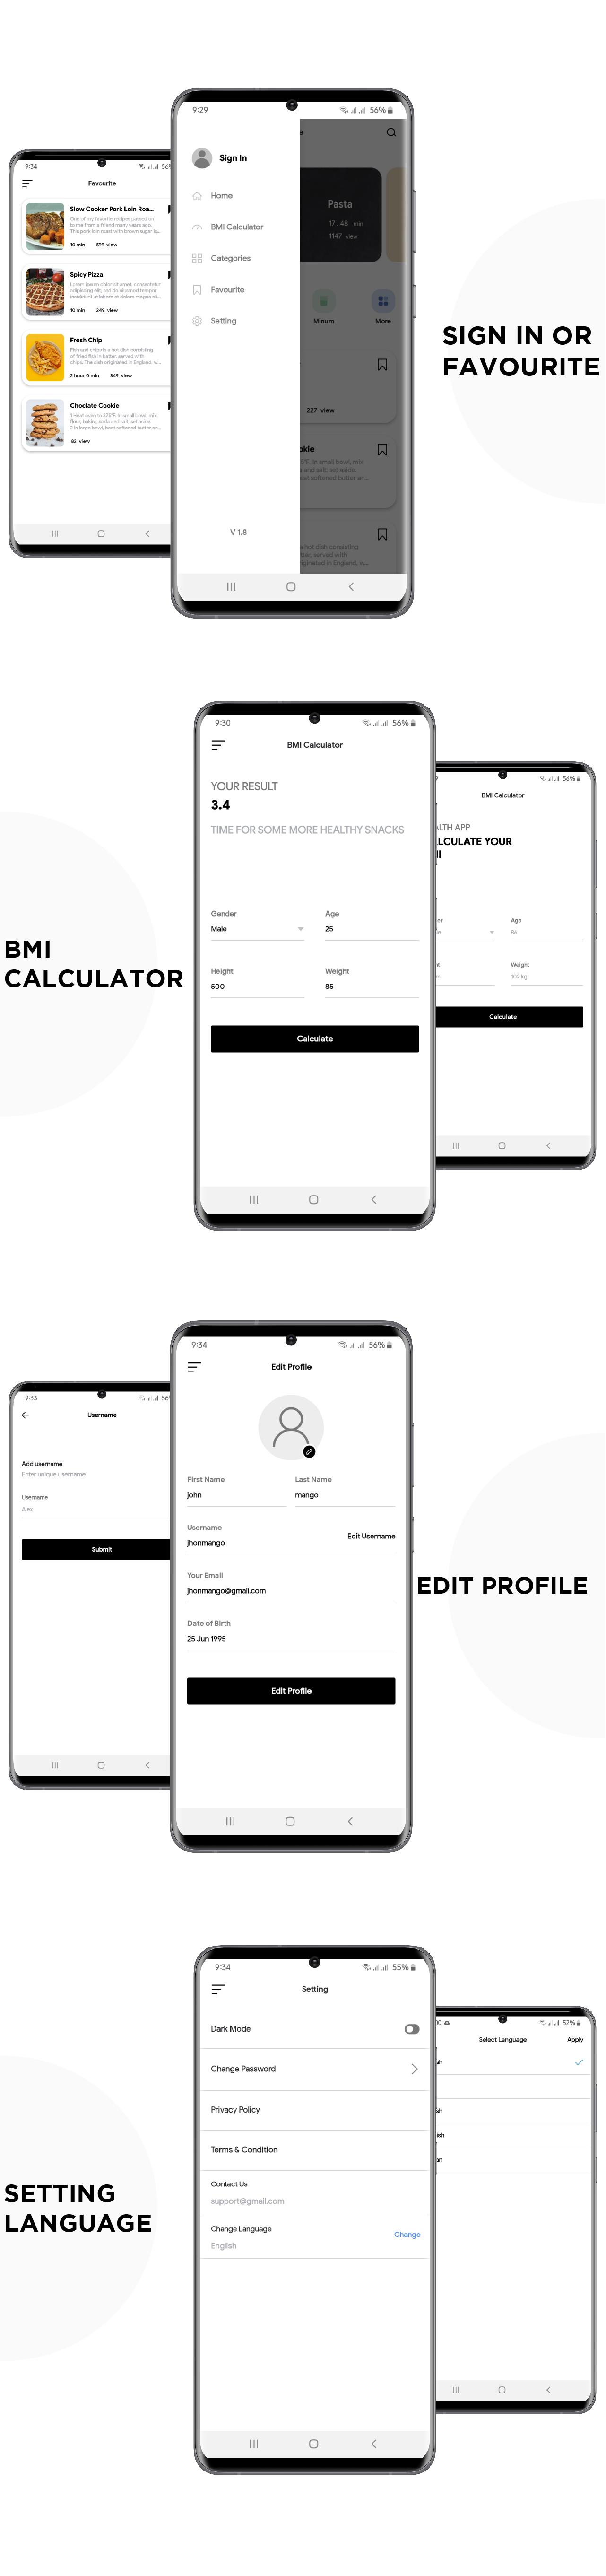 Yummy - Food Recipe Native IOS App With Admin Panel - 4